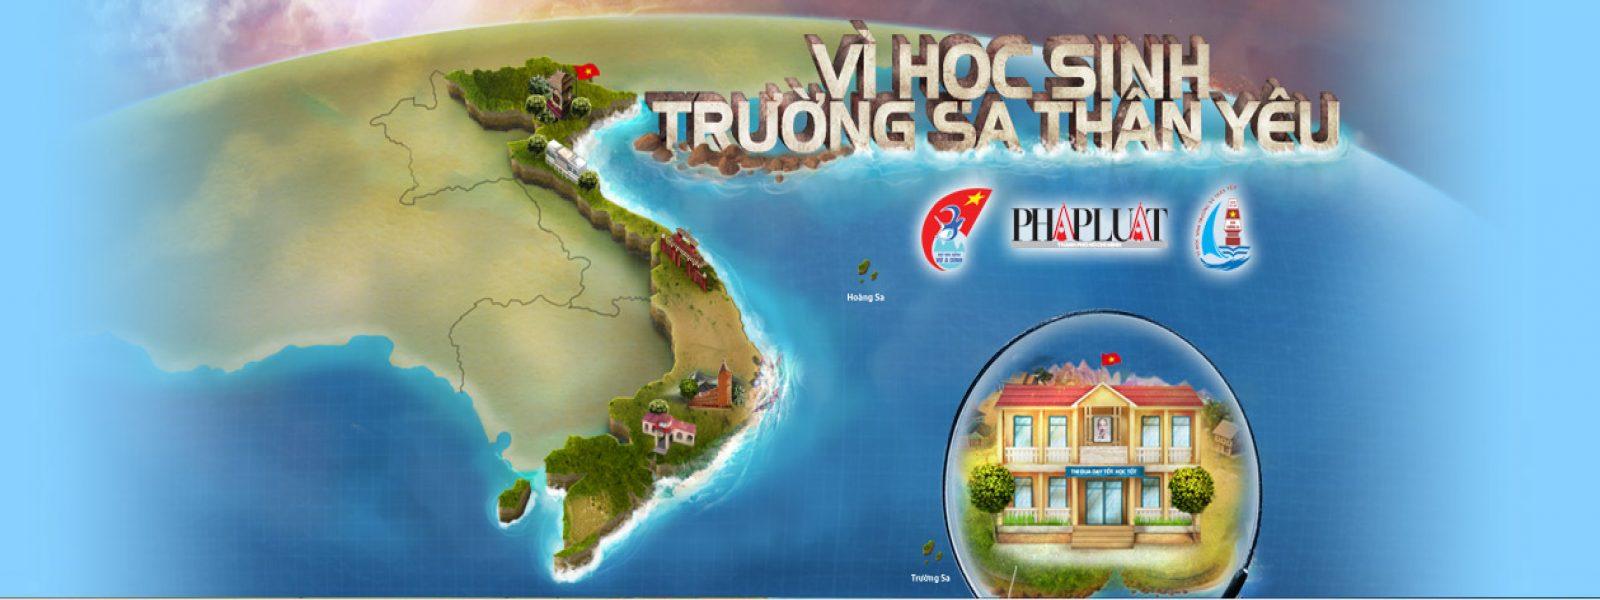 Vi hoc sinh Truong Sa than yeu